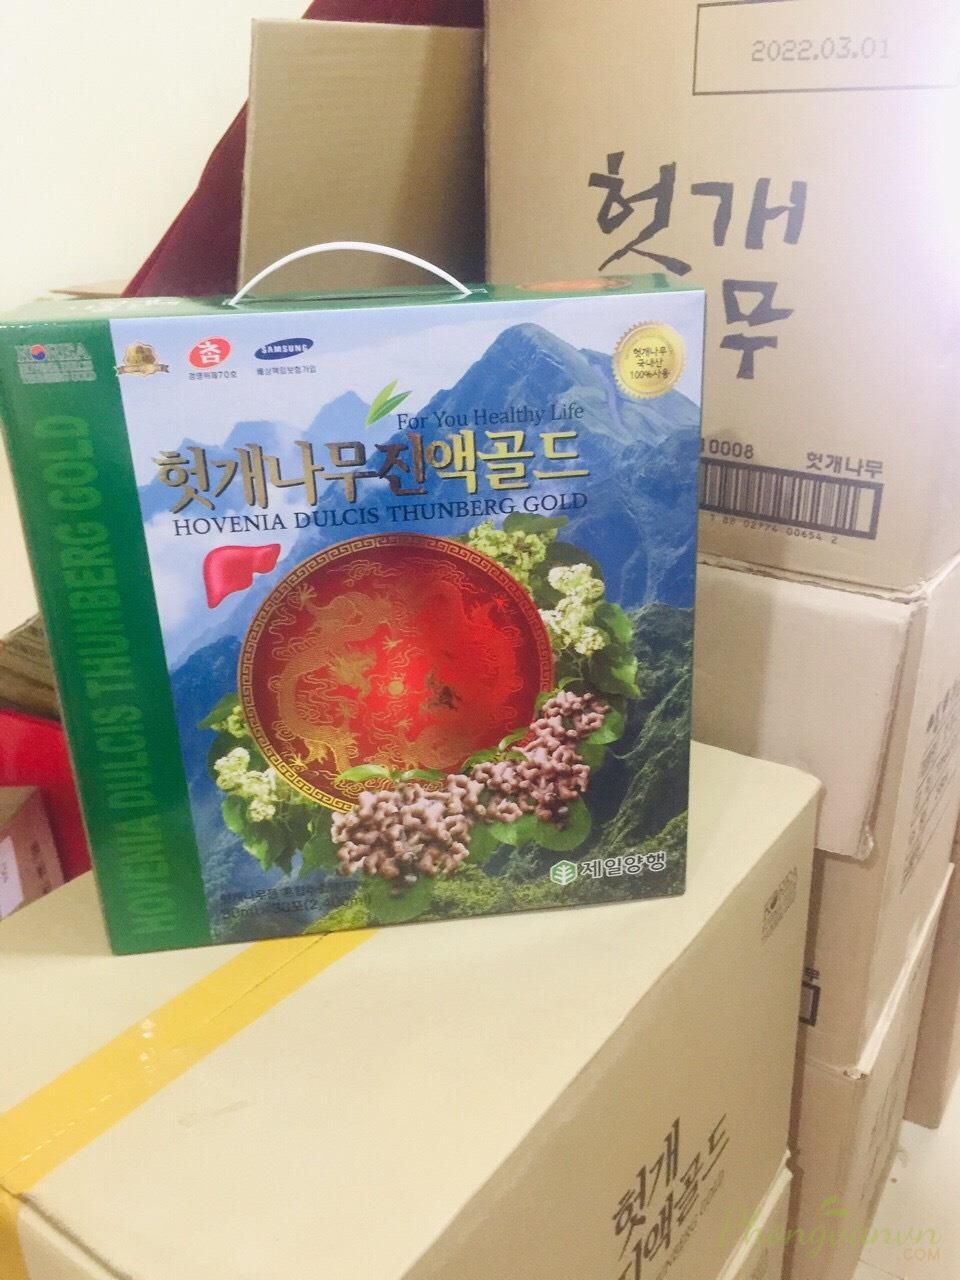 nuoc-mat-gan-giai-ruou-rong-do-hovenia-dulcis-thunb-bio-han-quoc